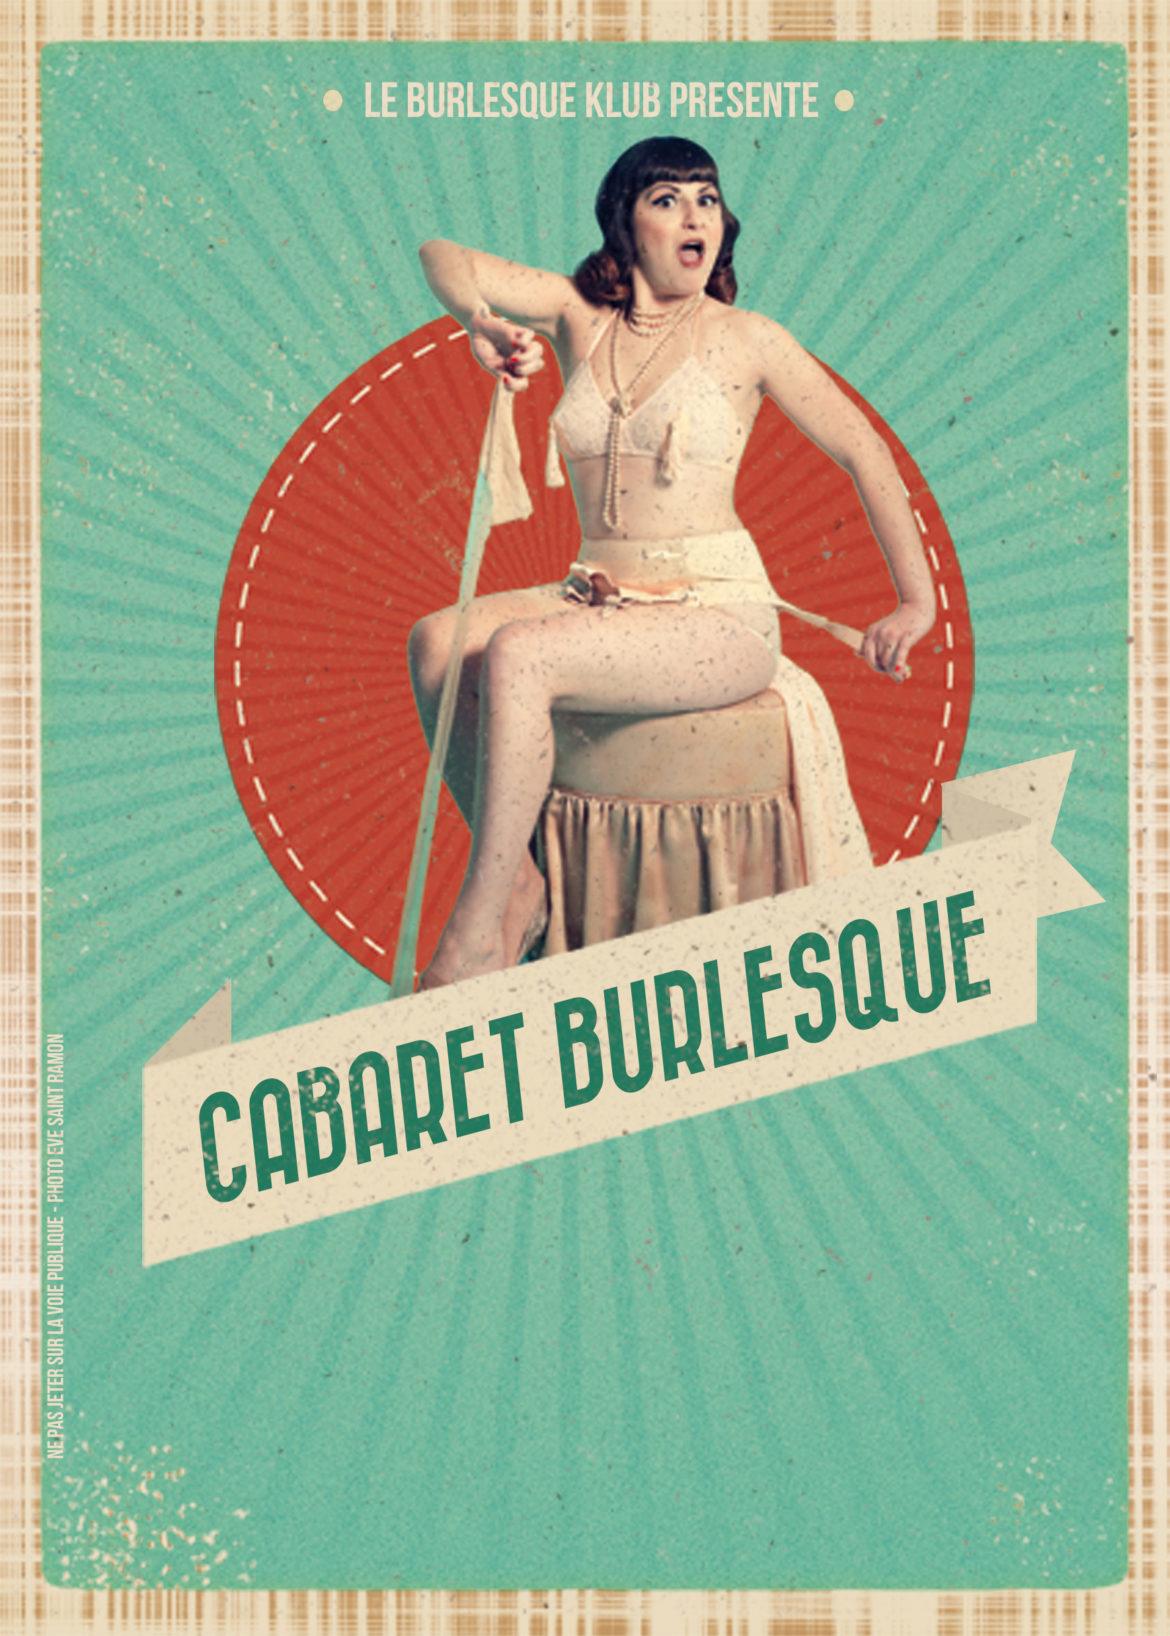 Le Burlesque Klub